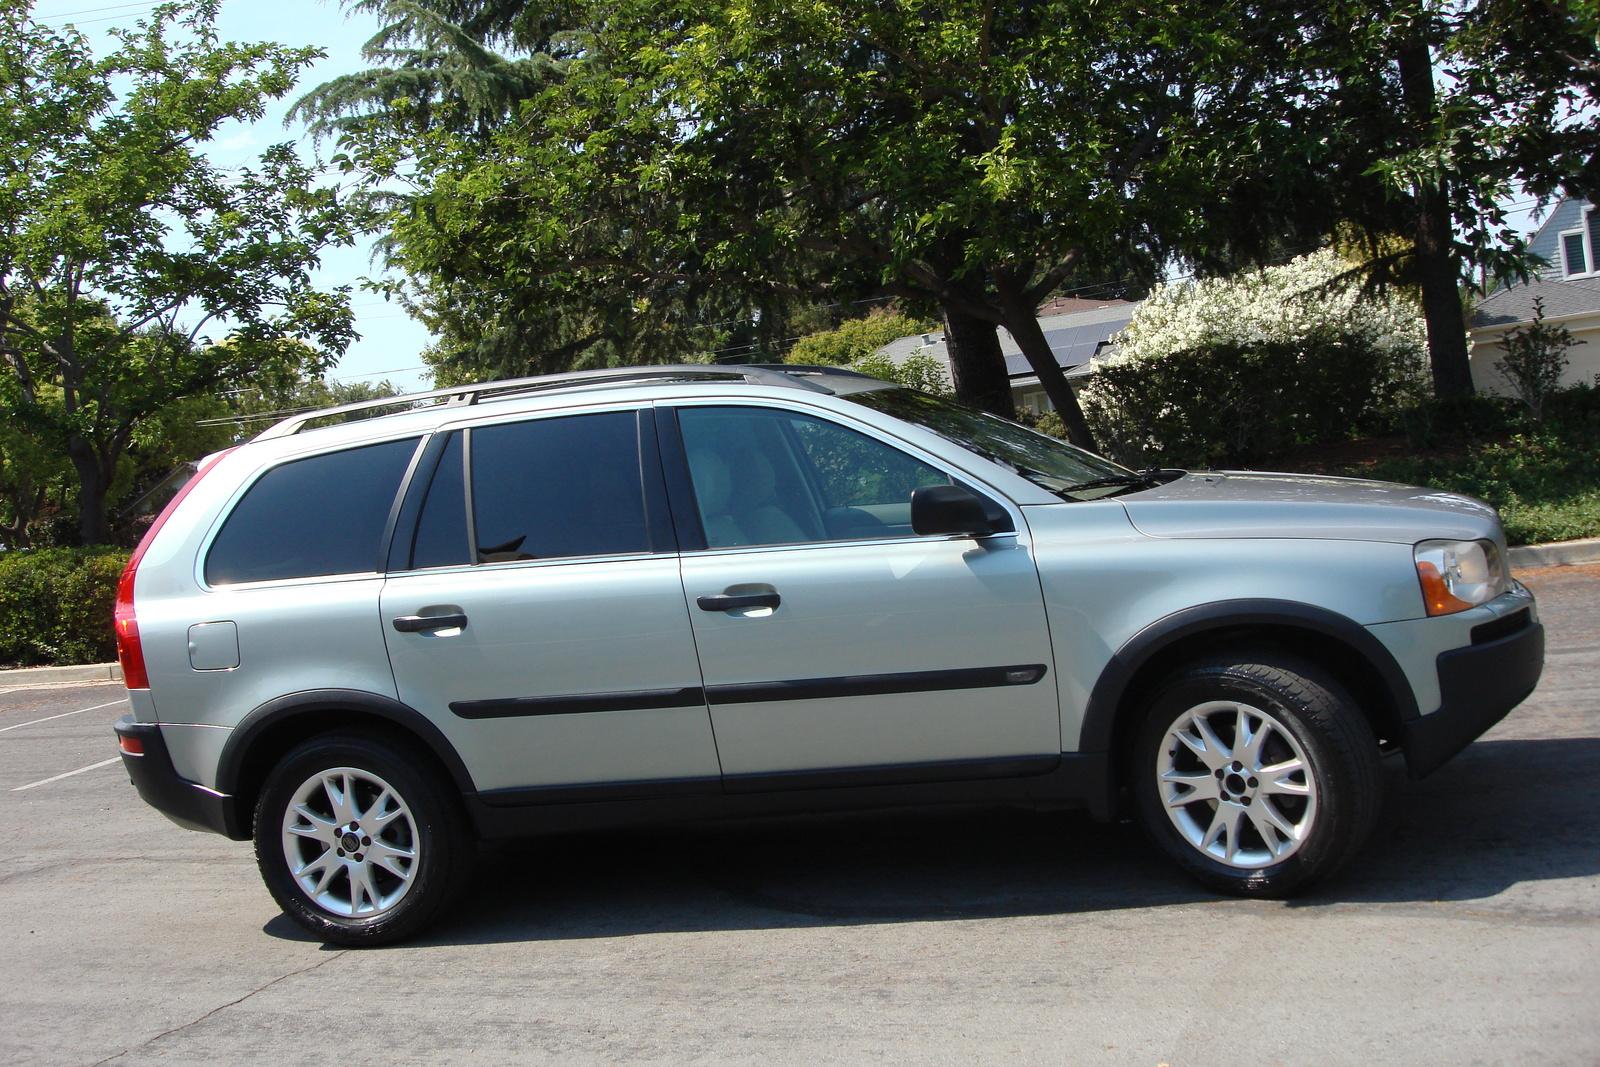 Used Cars Louisville Ky >> Volvo Xc90 Awd Ebay | Autos Post